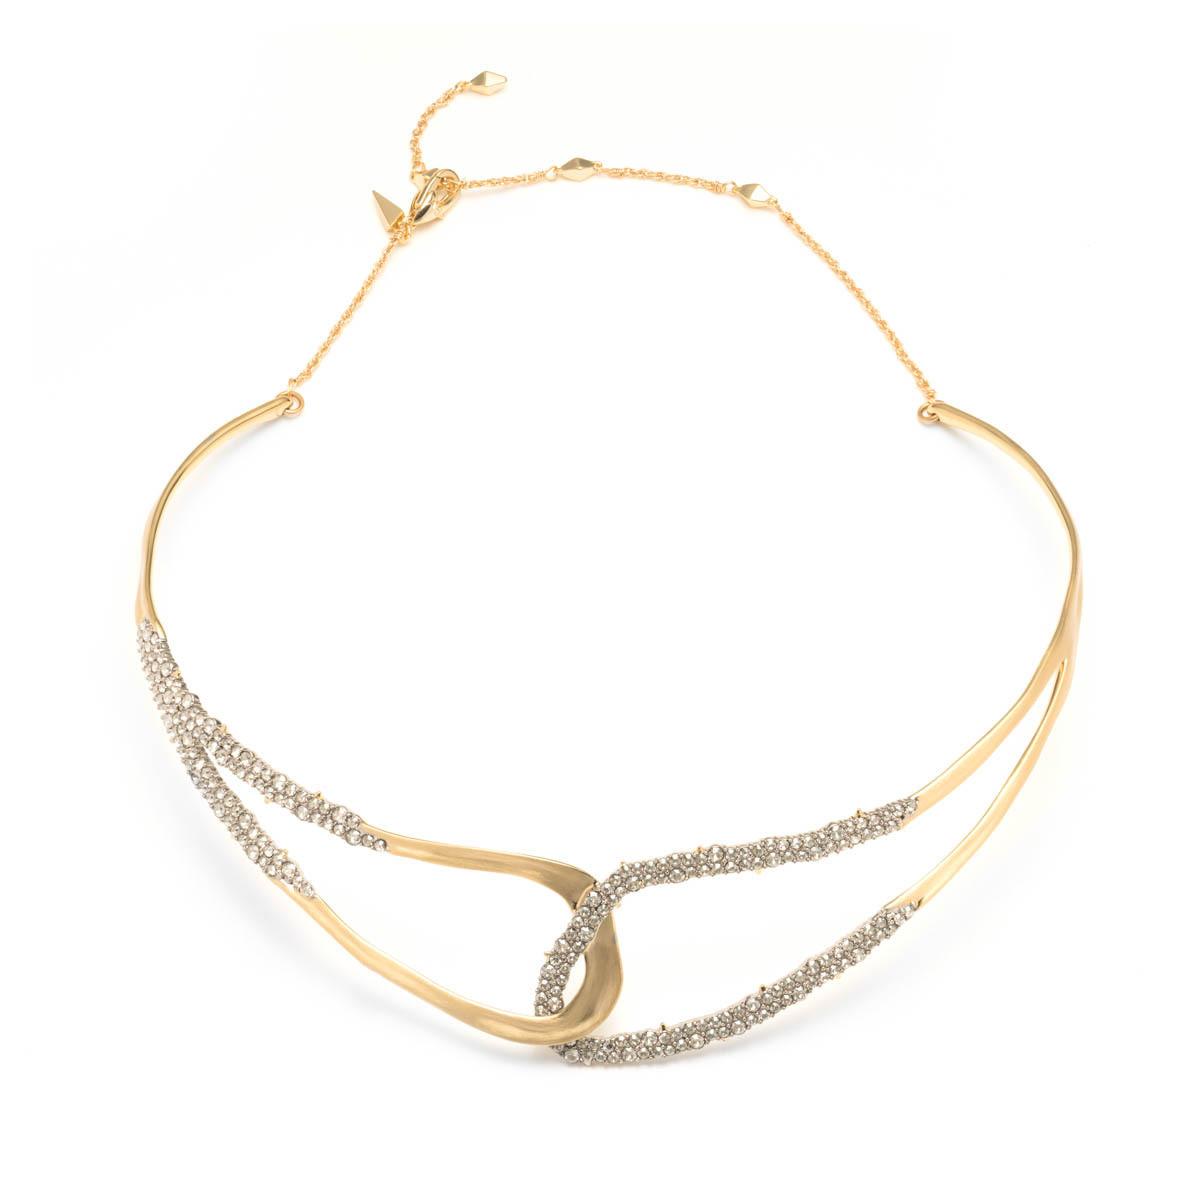 Freeform Adjustable Collar Necklace